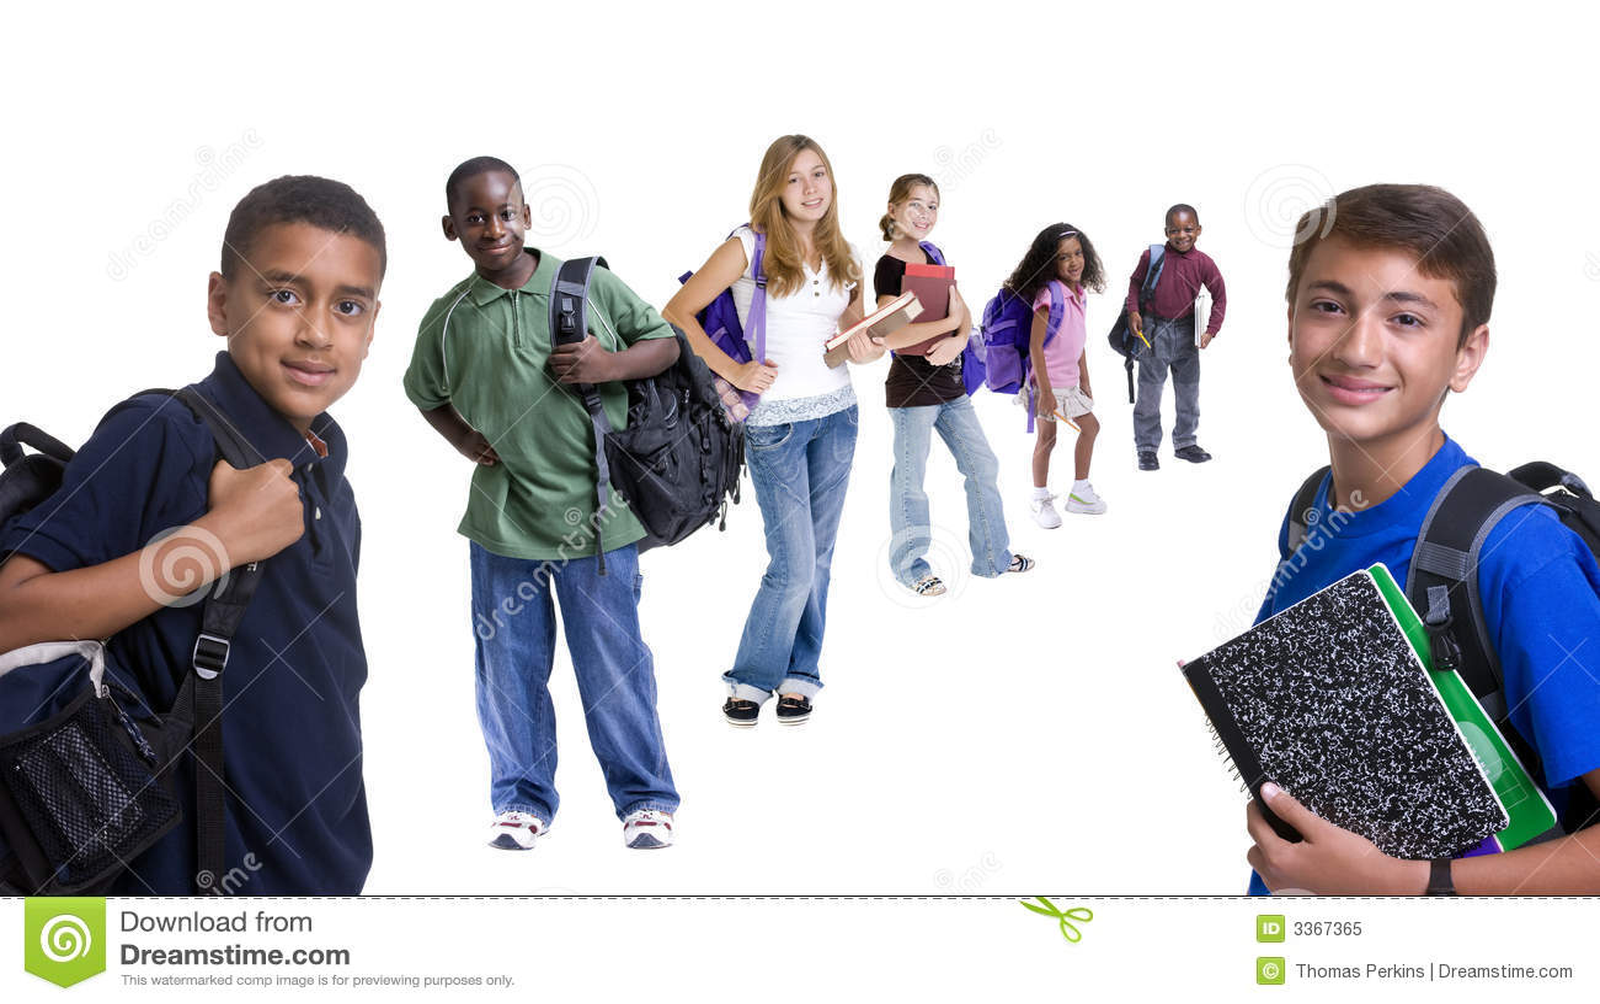 dissertations on school safety